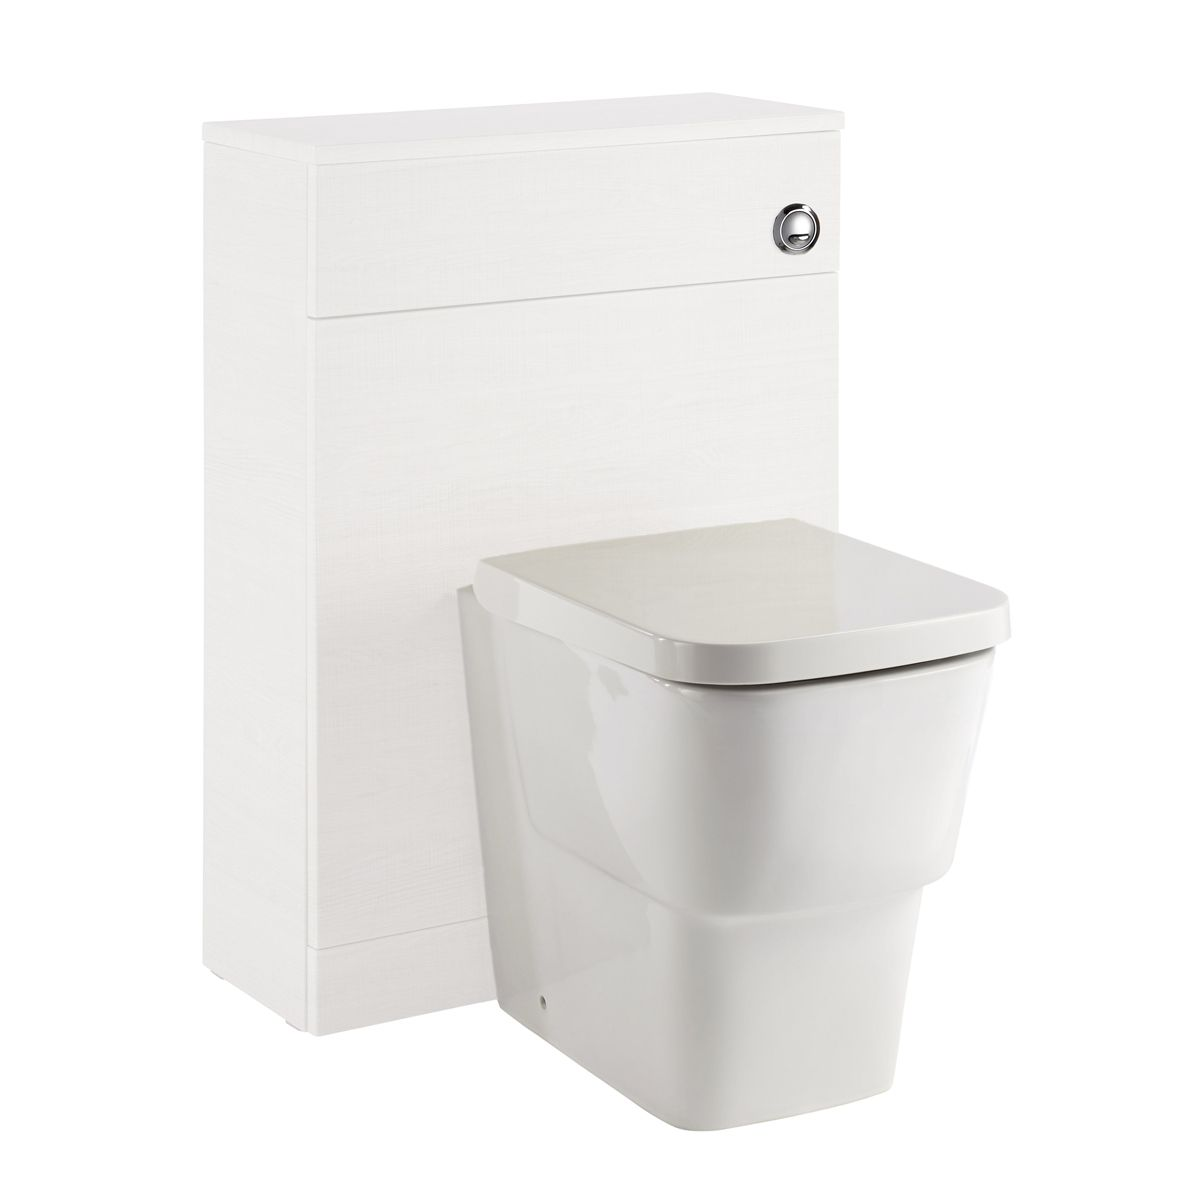 Frontline Vitale Gloss White WC Unit